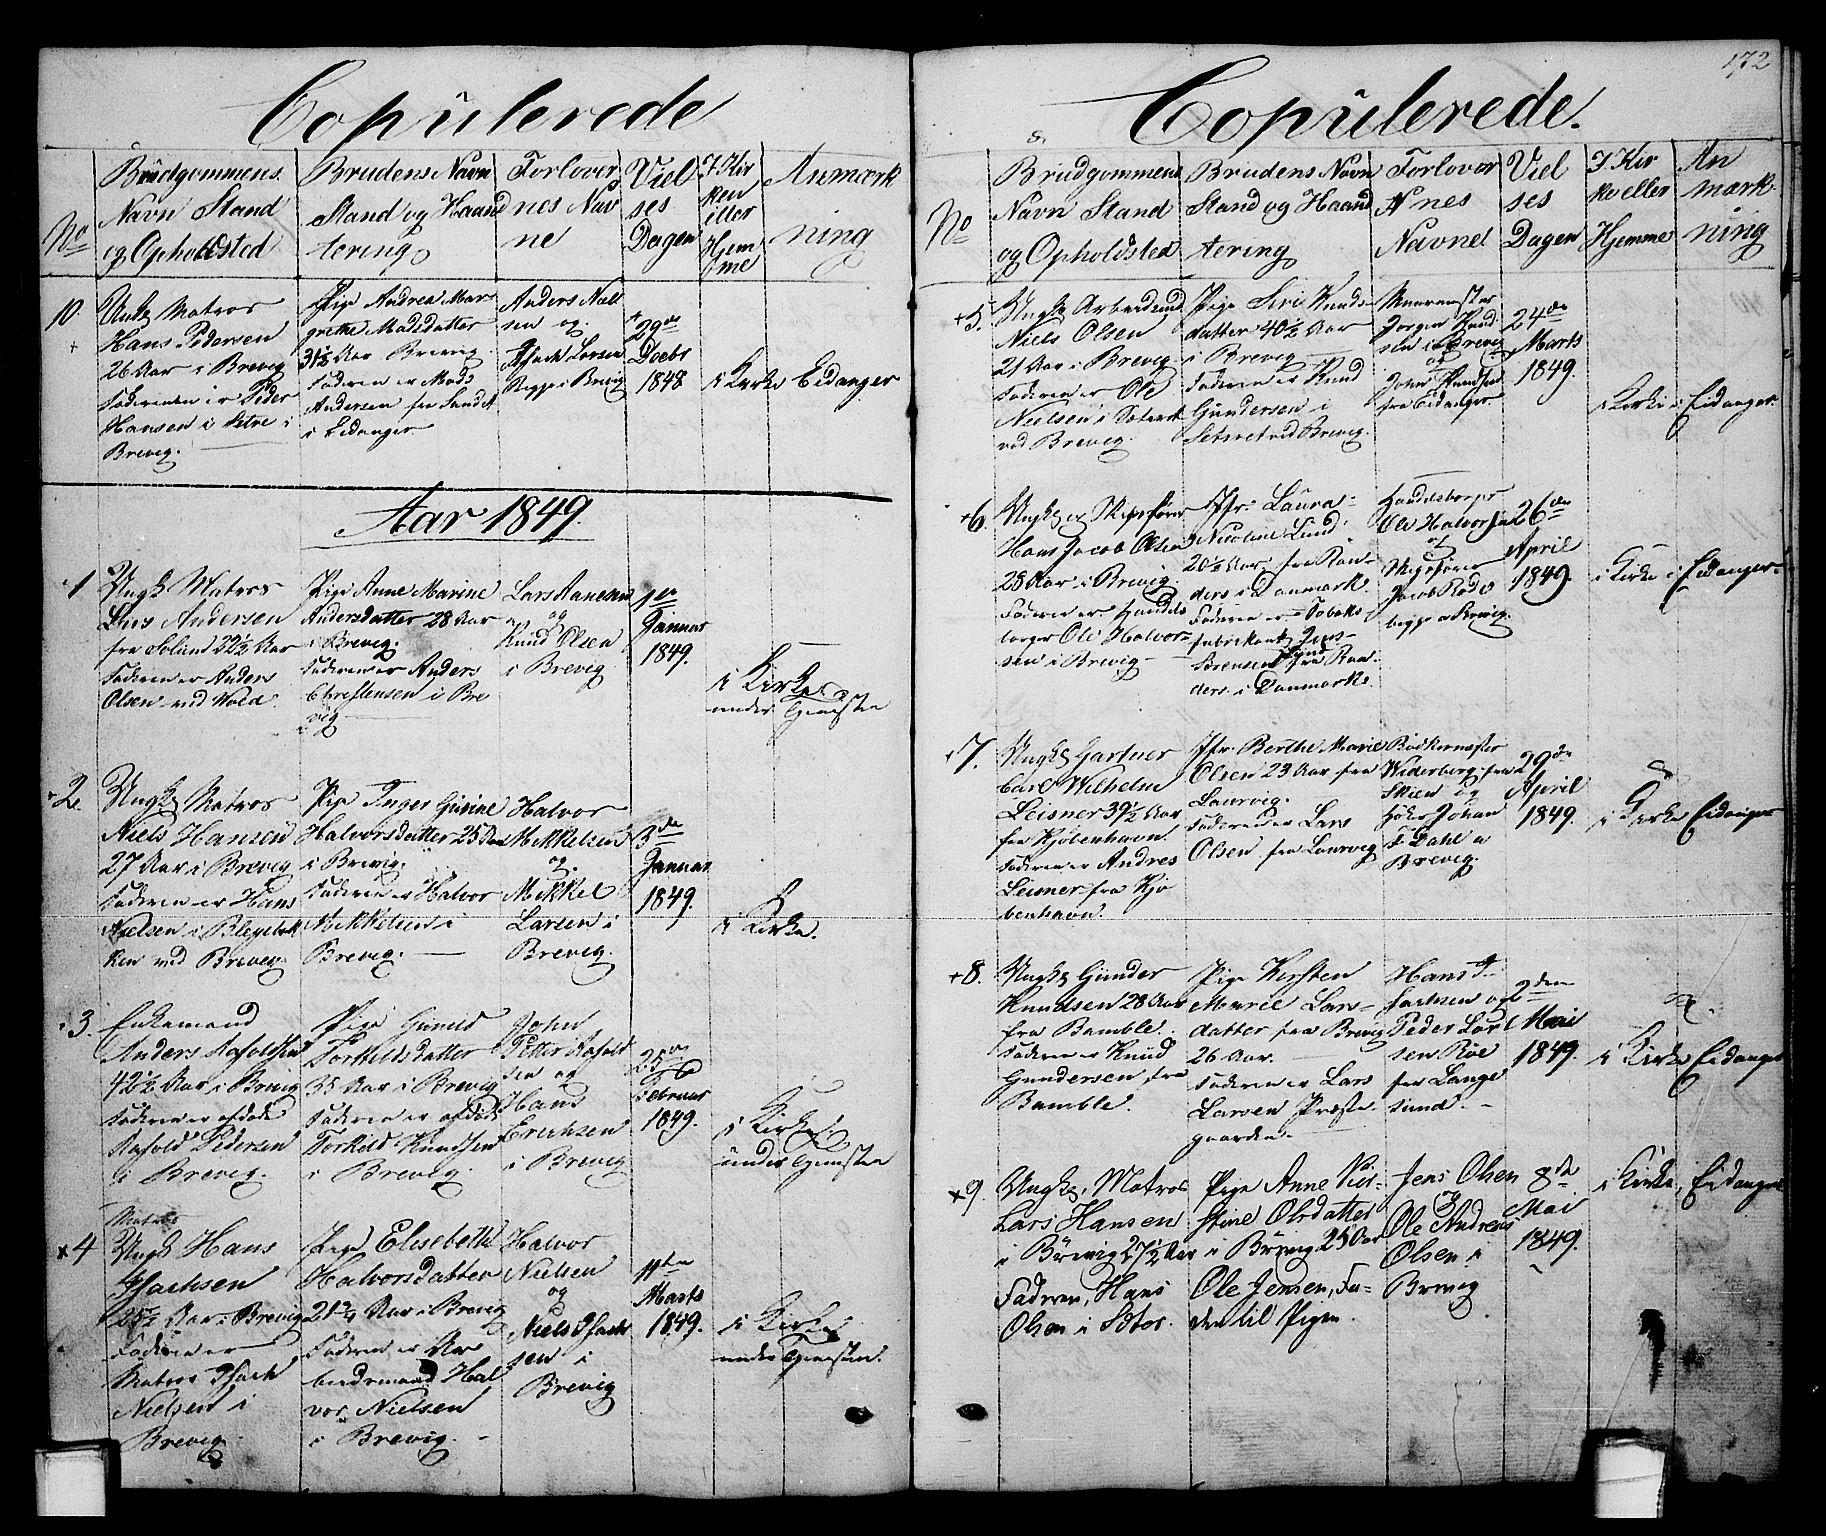 SAKO, Brevik kirkebøker, G/Ga/L0002: Klokkerbok nr. 2, 1846-1865, s. 172